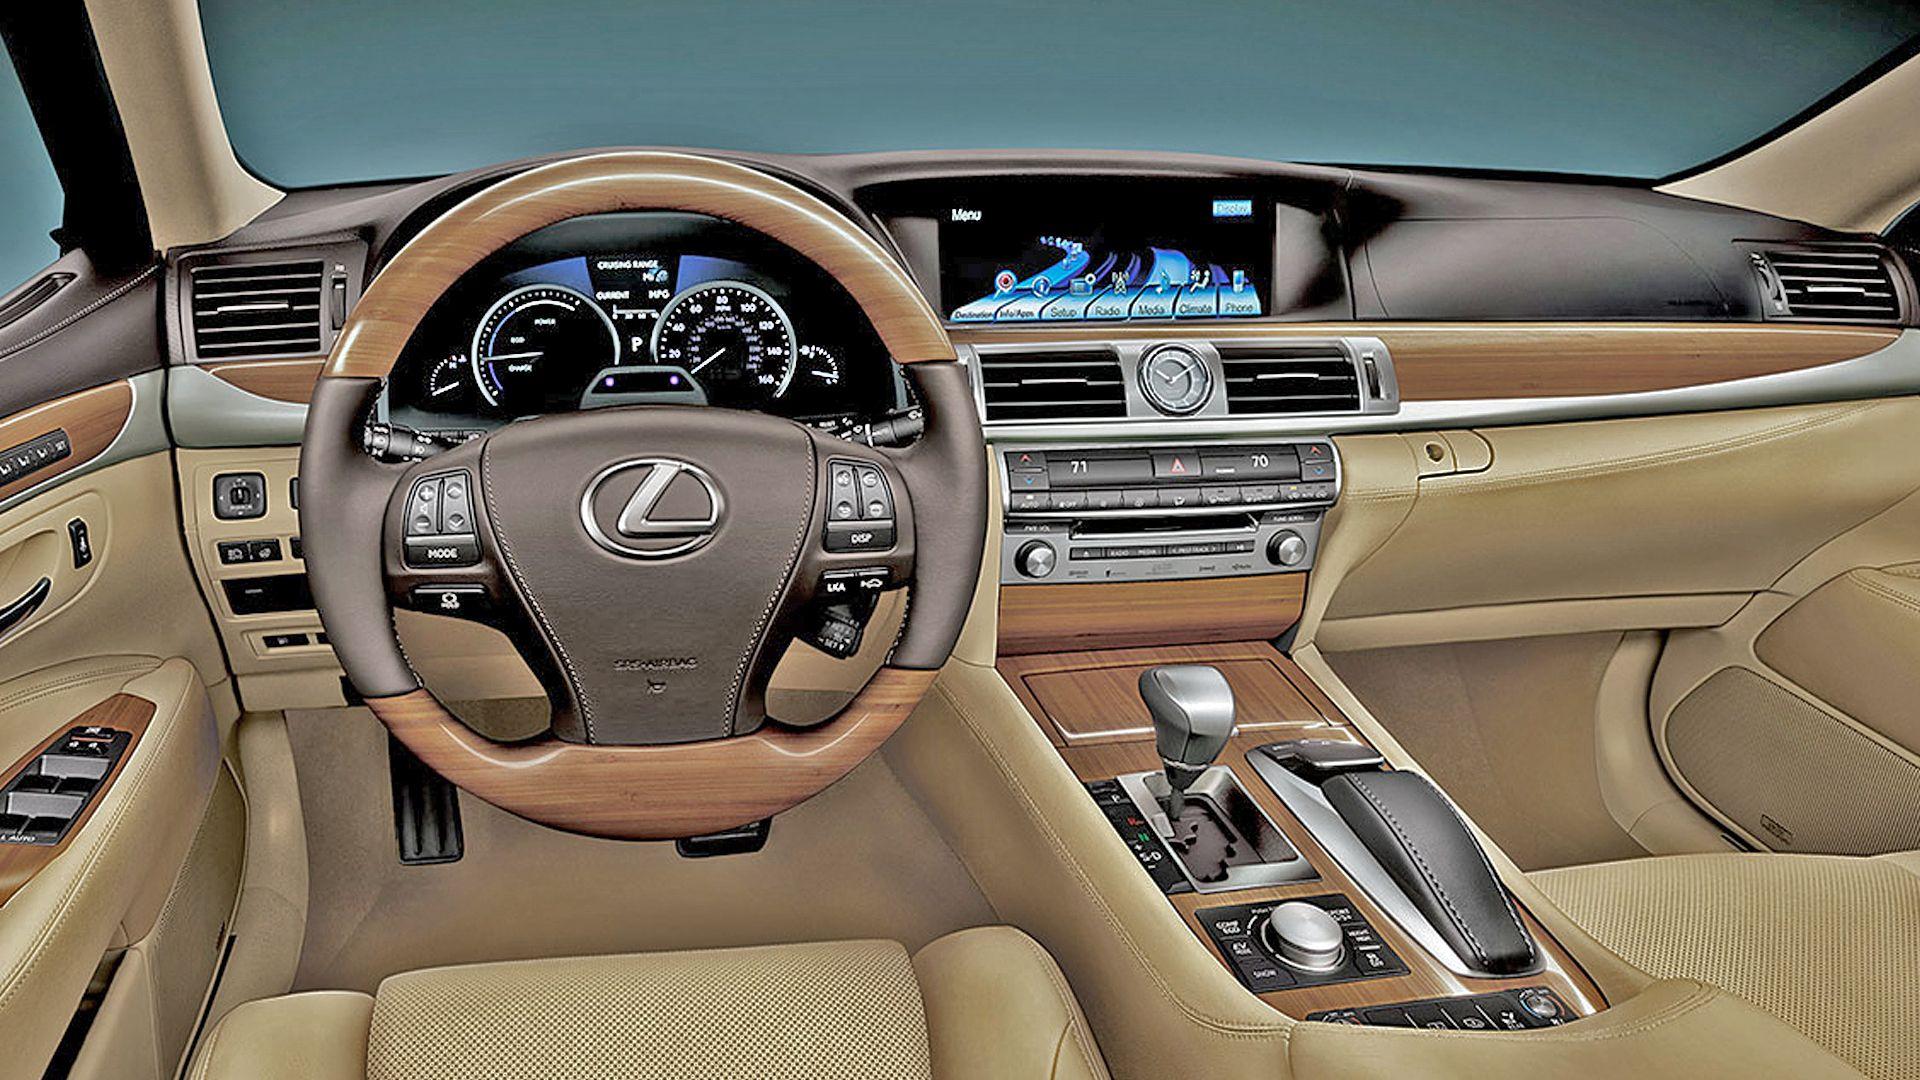 2019 lexus ls 460 interior design good cars 2018 2019 model year pinterest. Black Bedroom Furniture Sets. Home Design Ideas